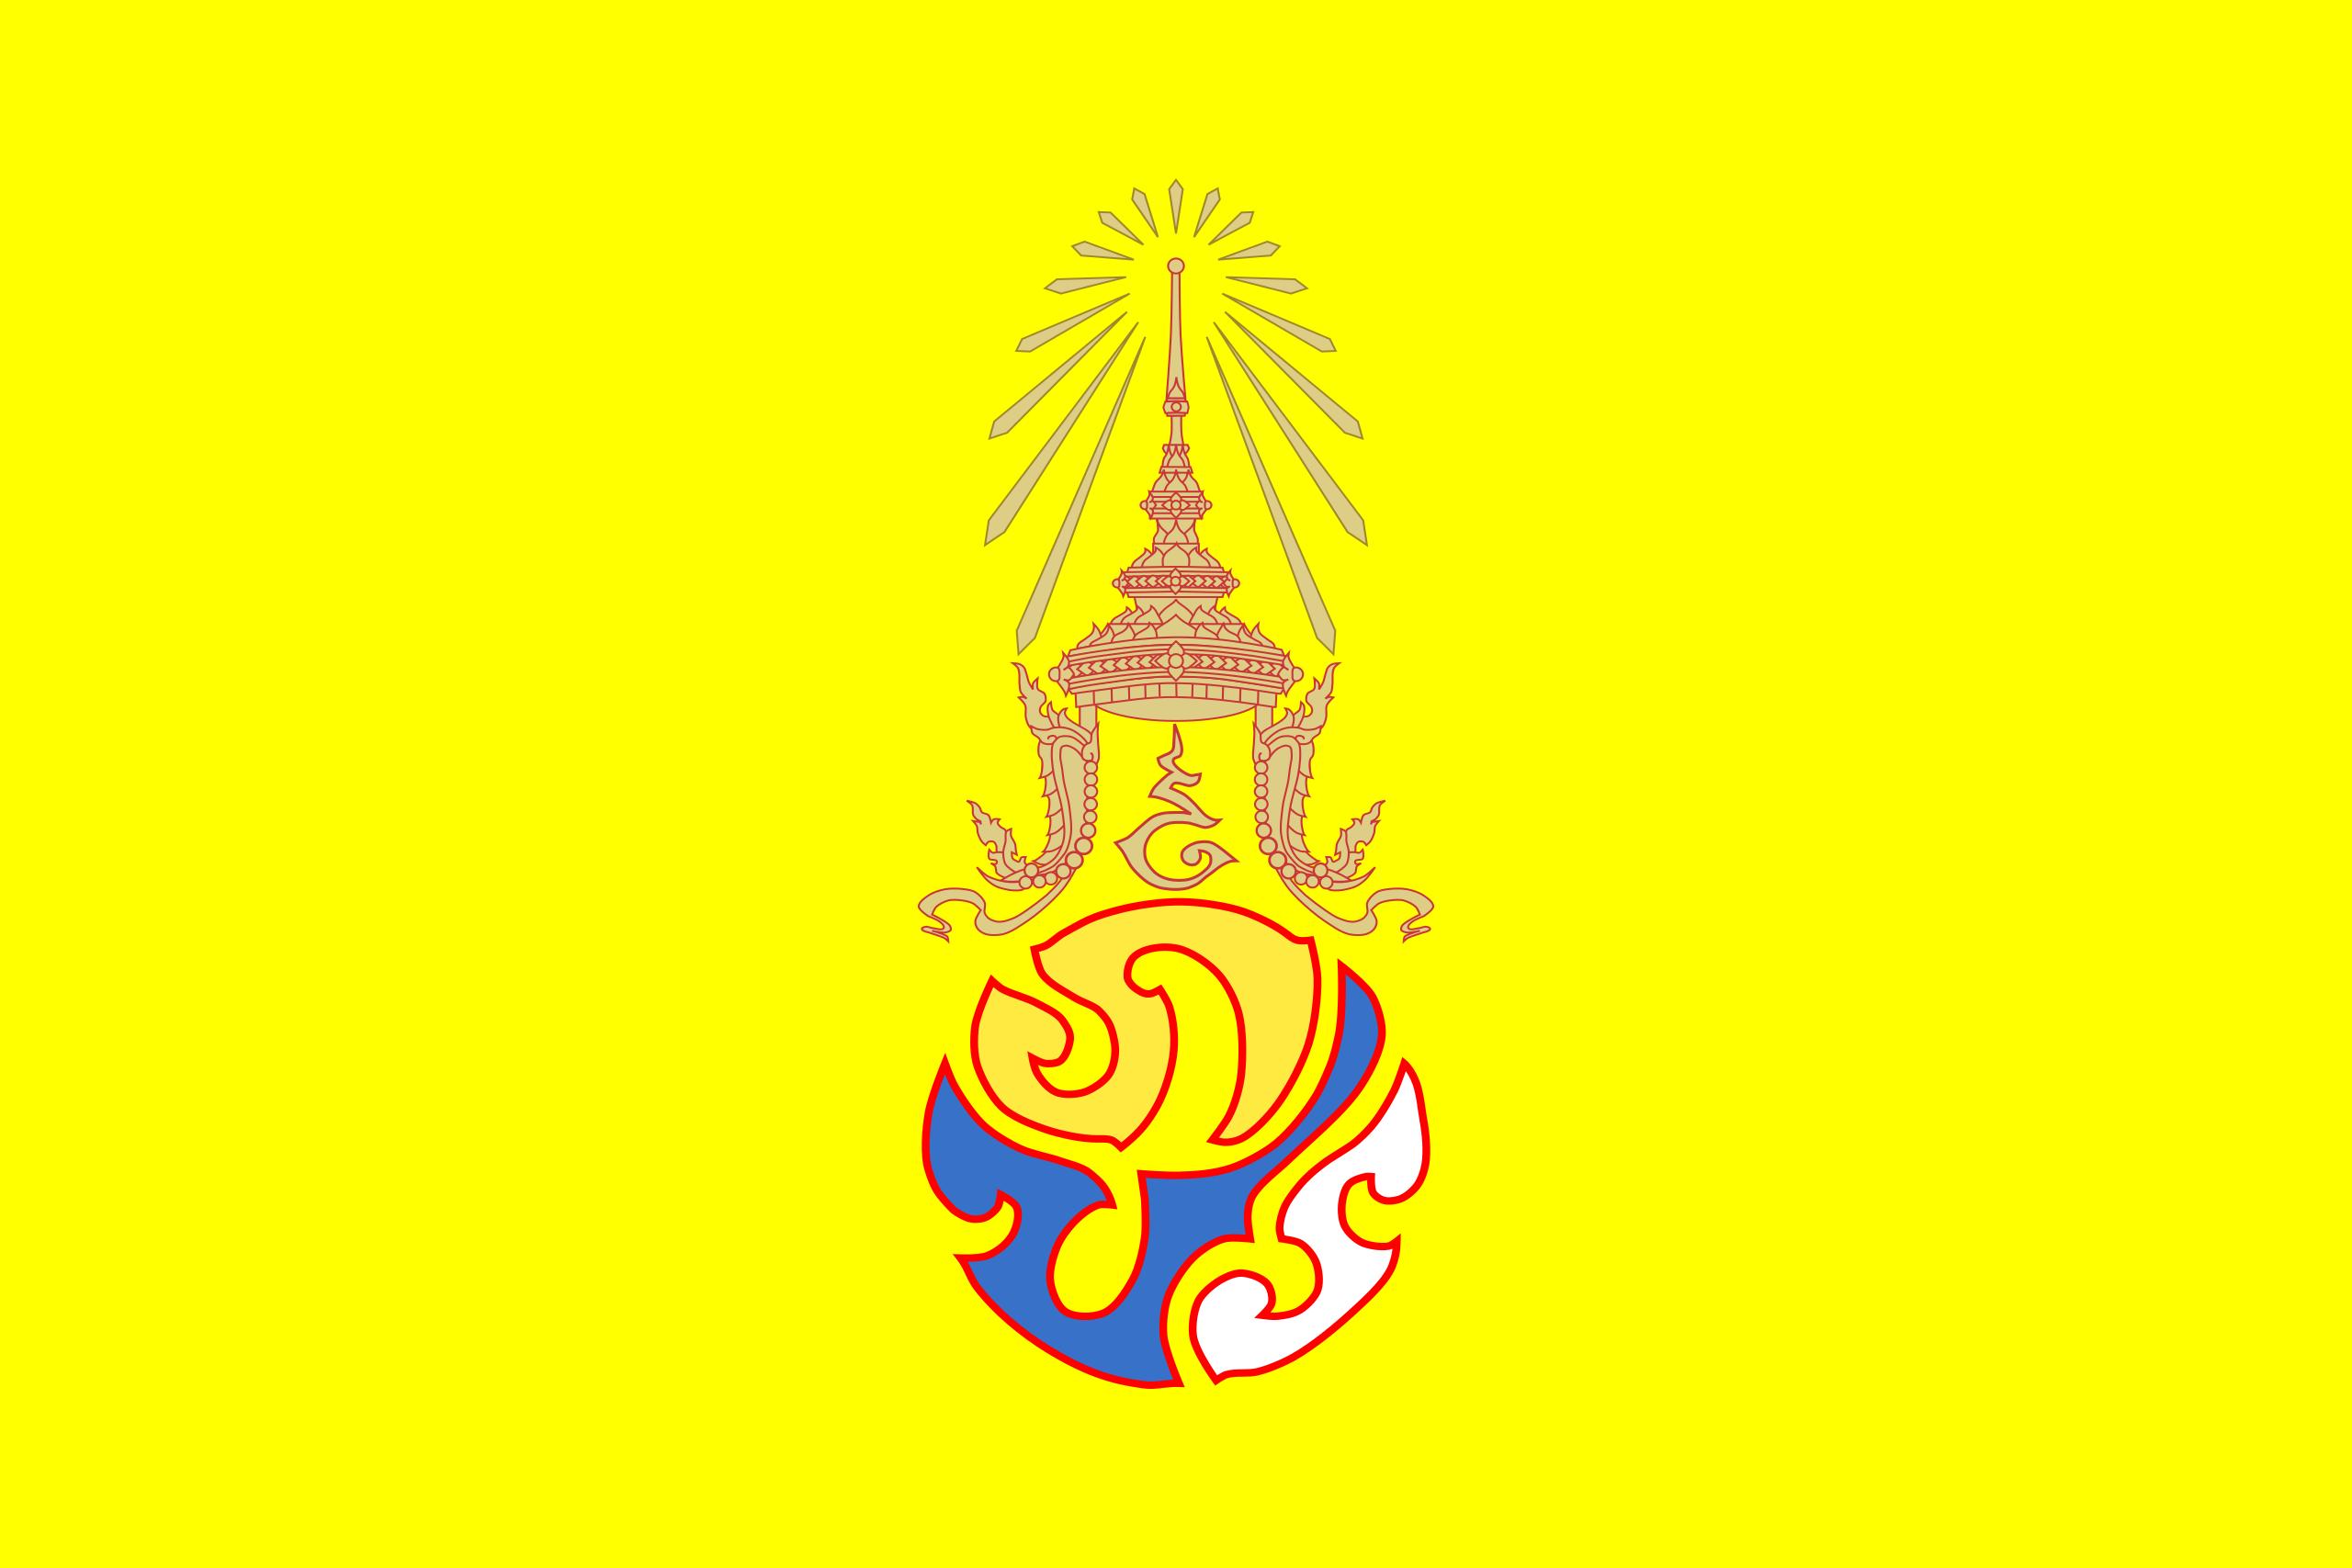 Royal Flags Of Thailand Bhumibol Adulyadej Bhumibol King Bhumibol Adulyadej